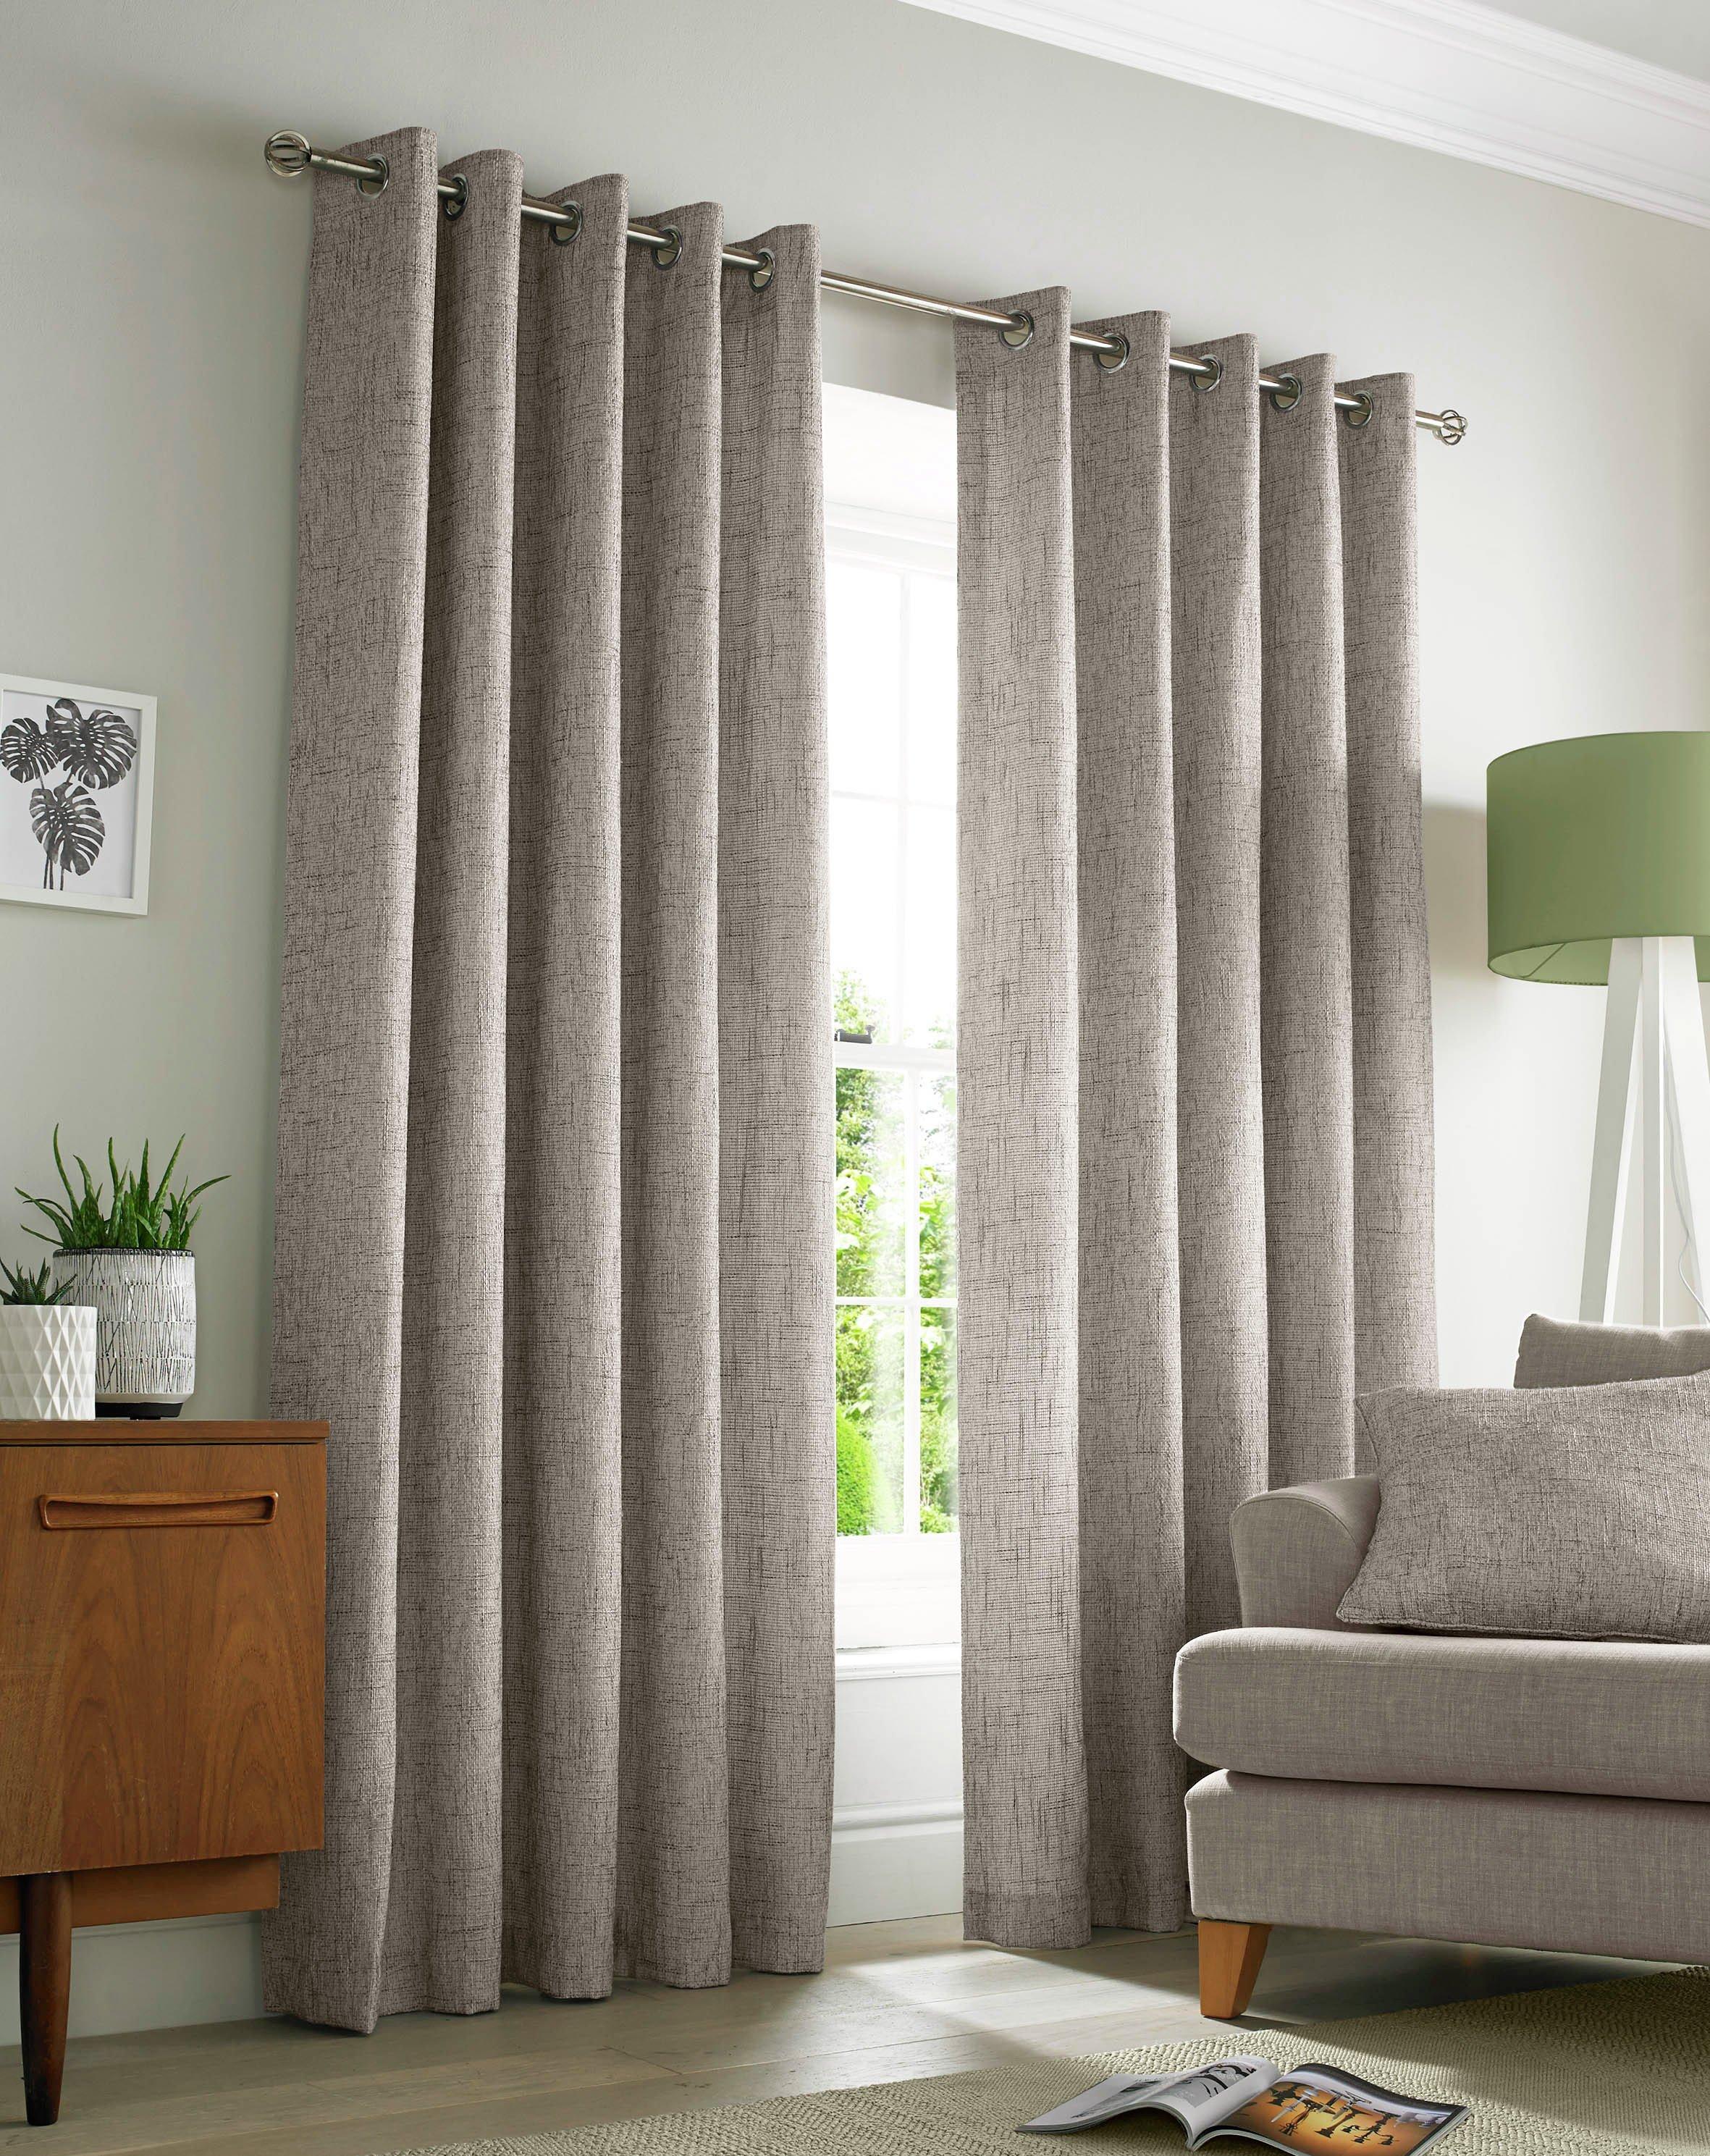 Academy Eyelet Curtains - 117x137cm - Natural.